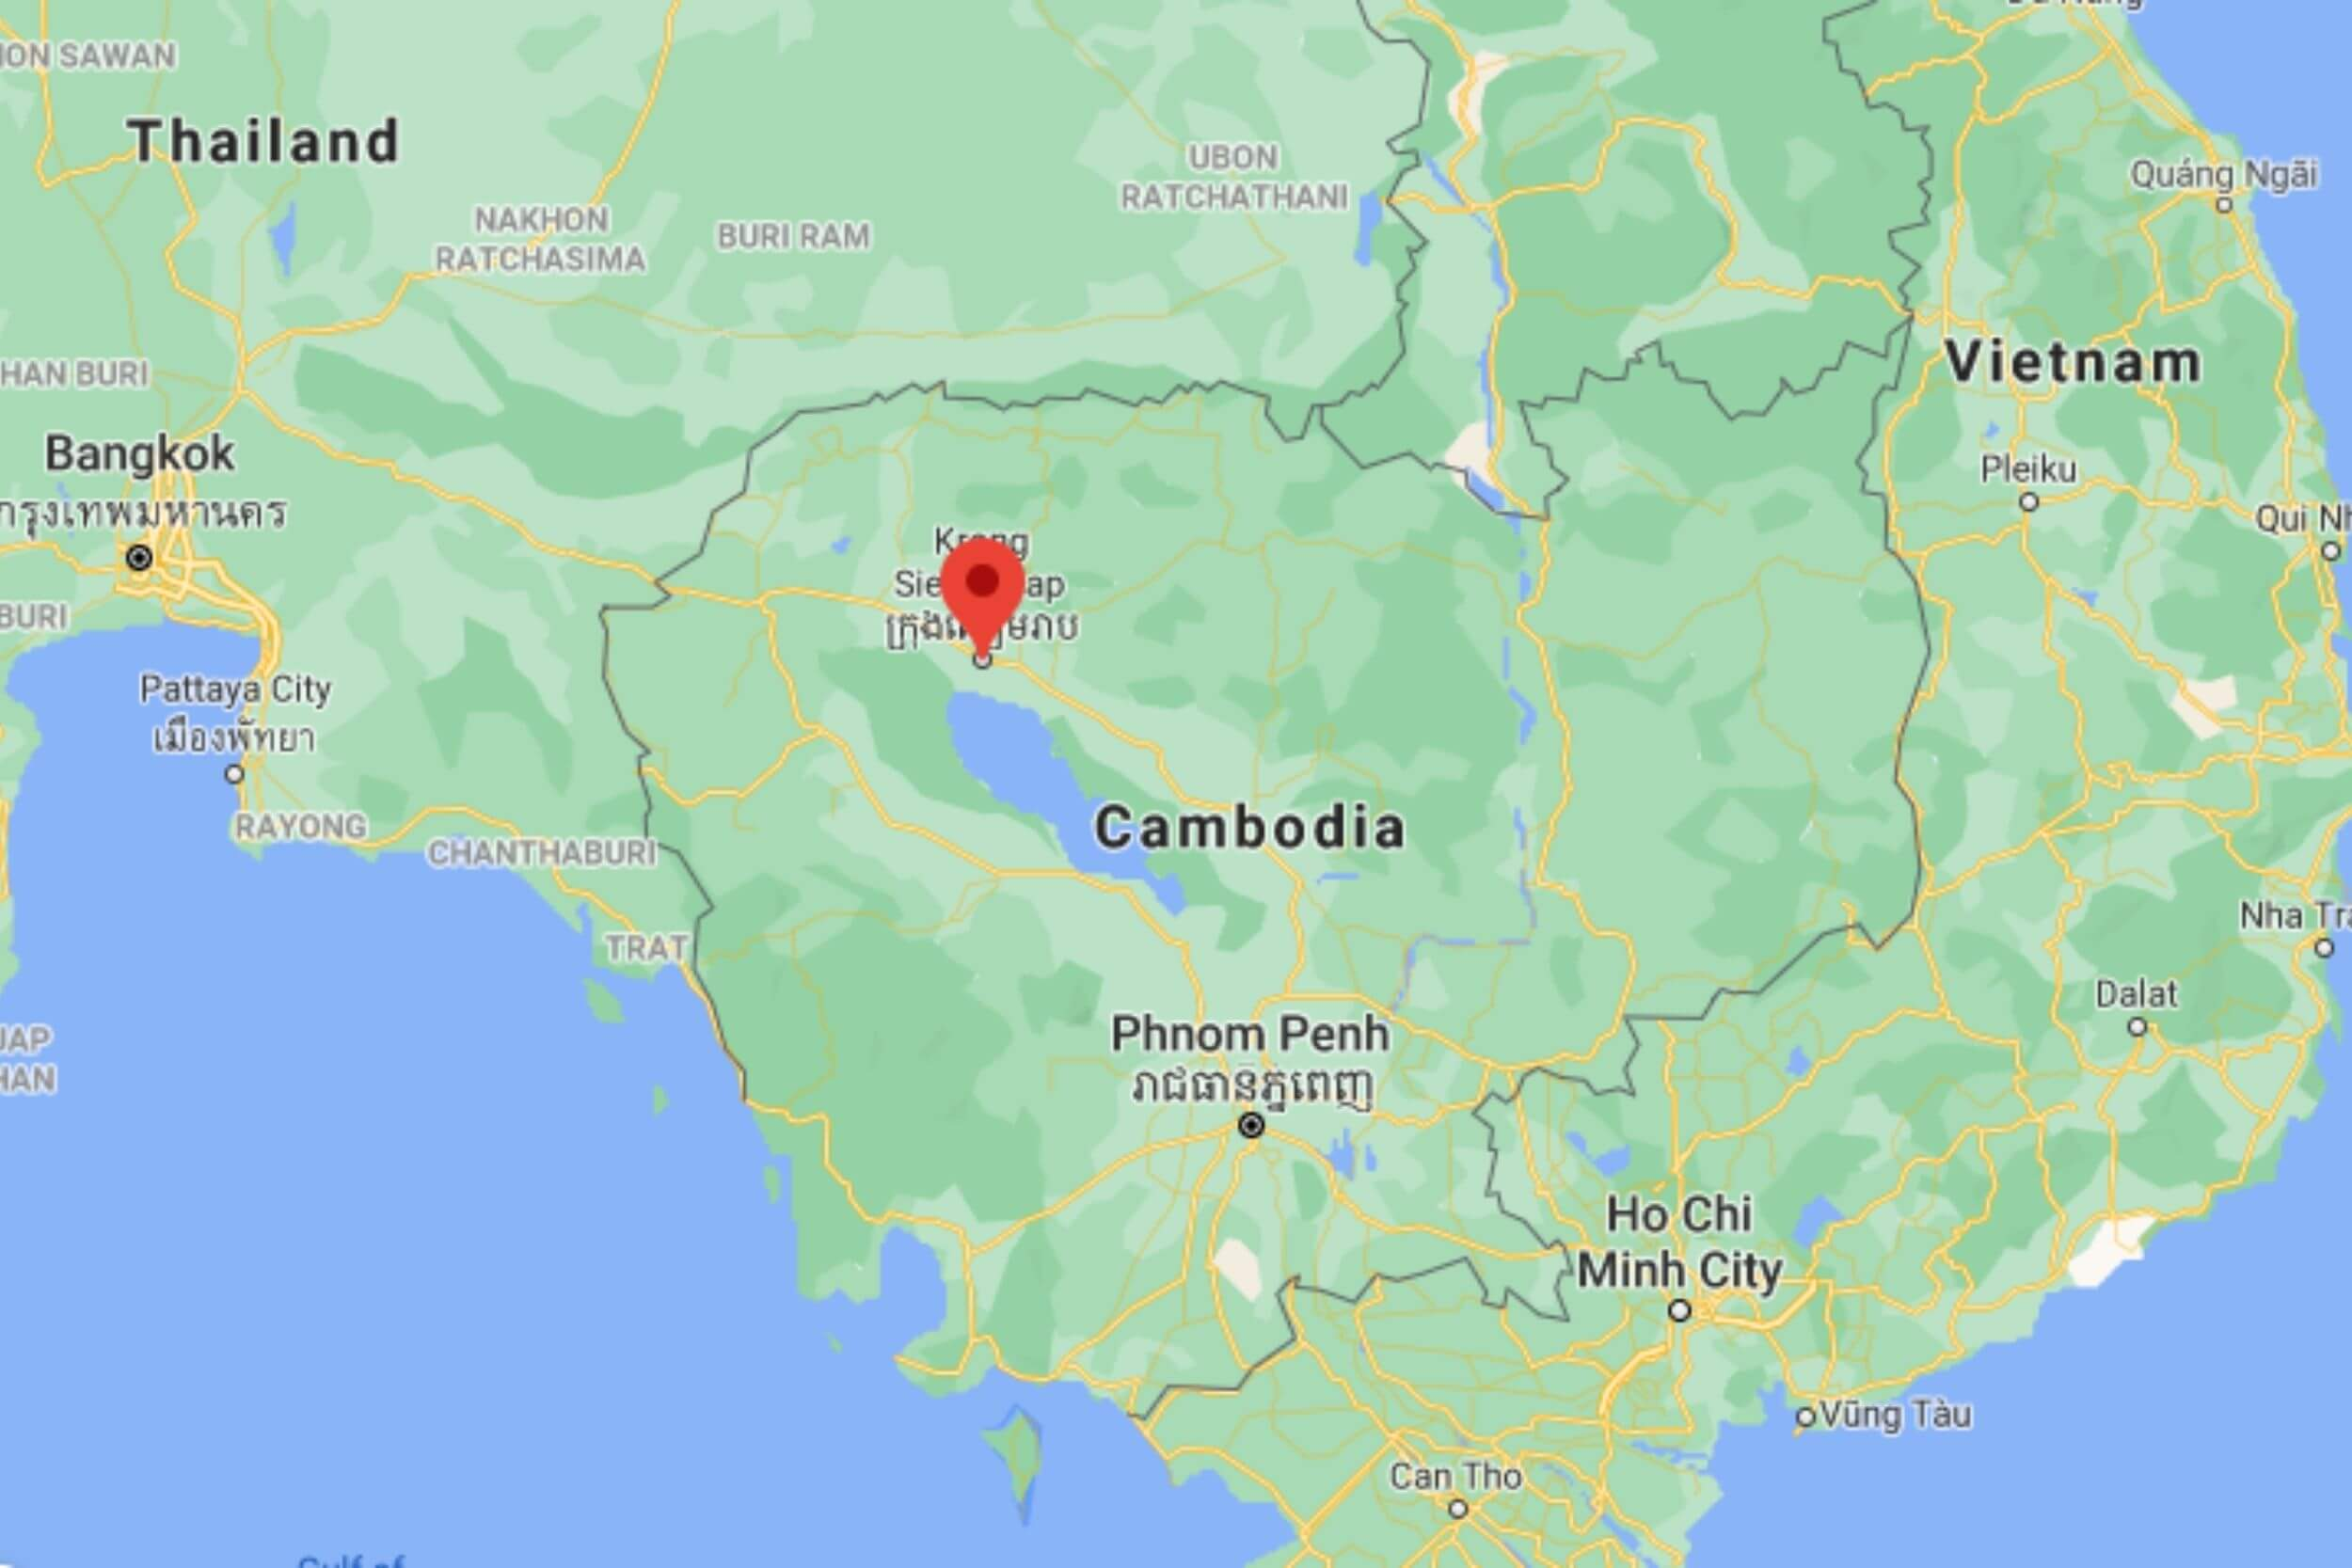 Siem Reap on map